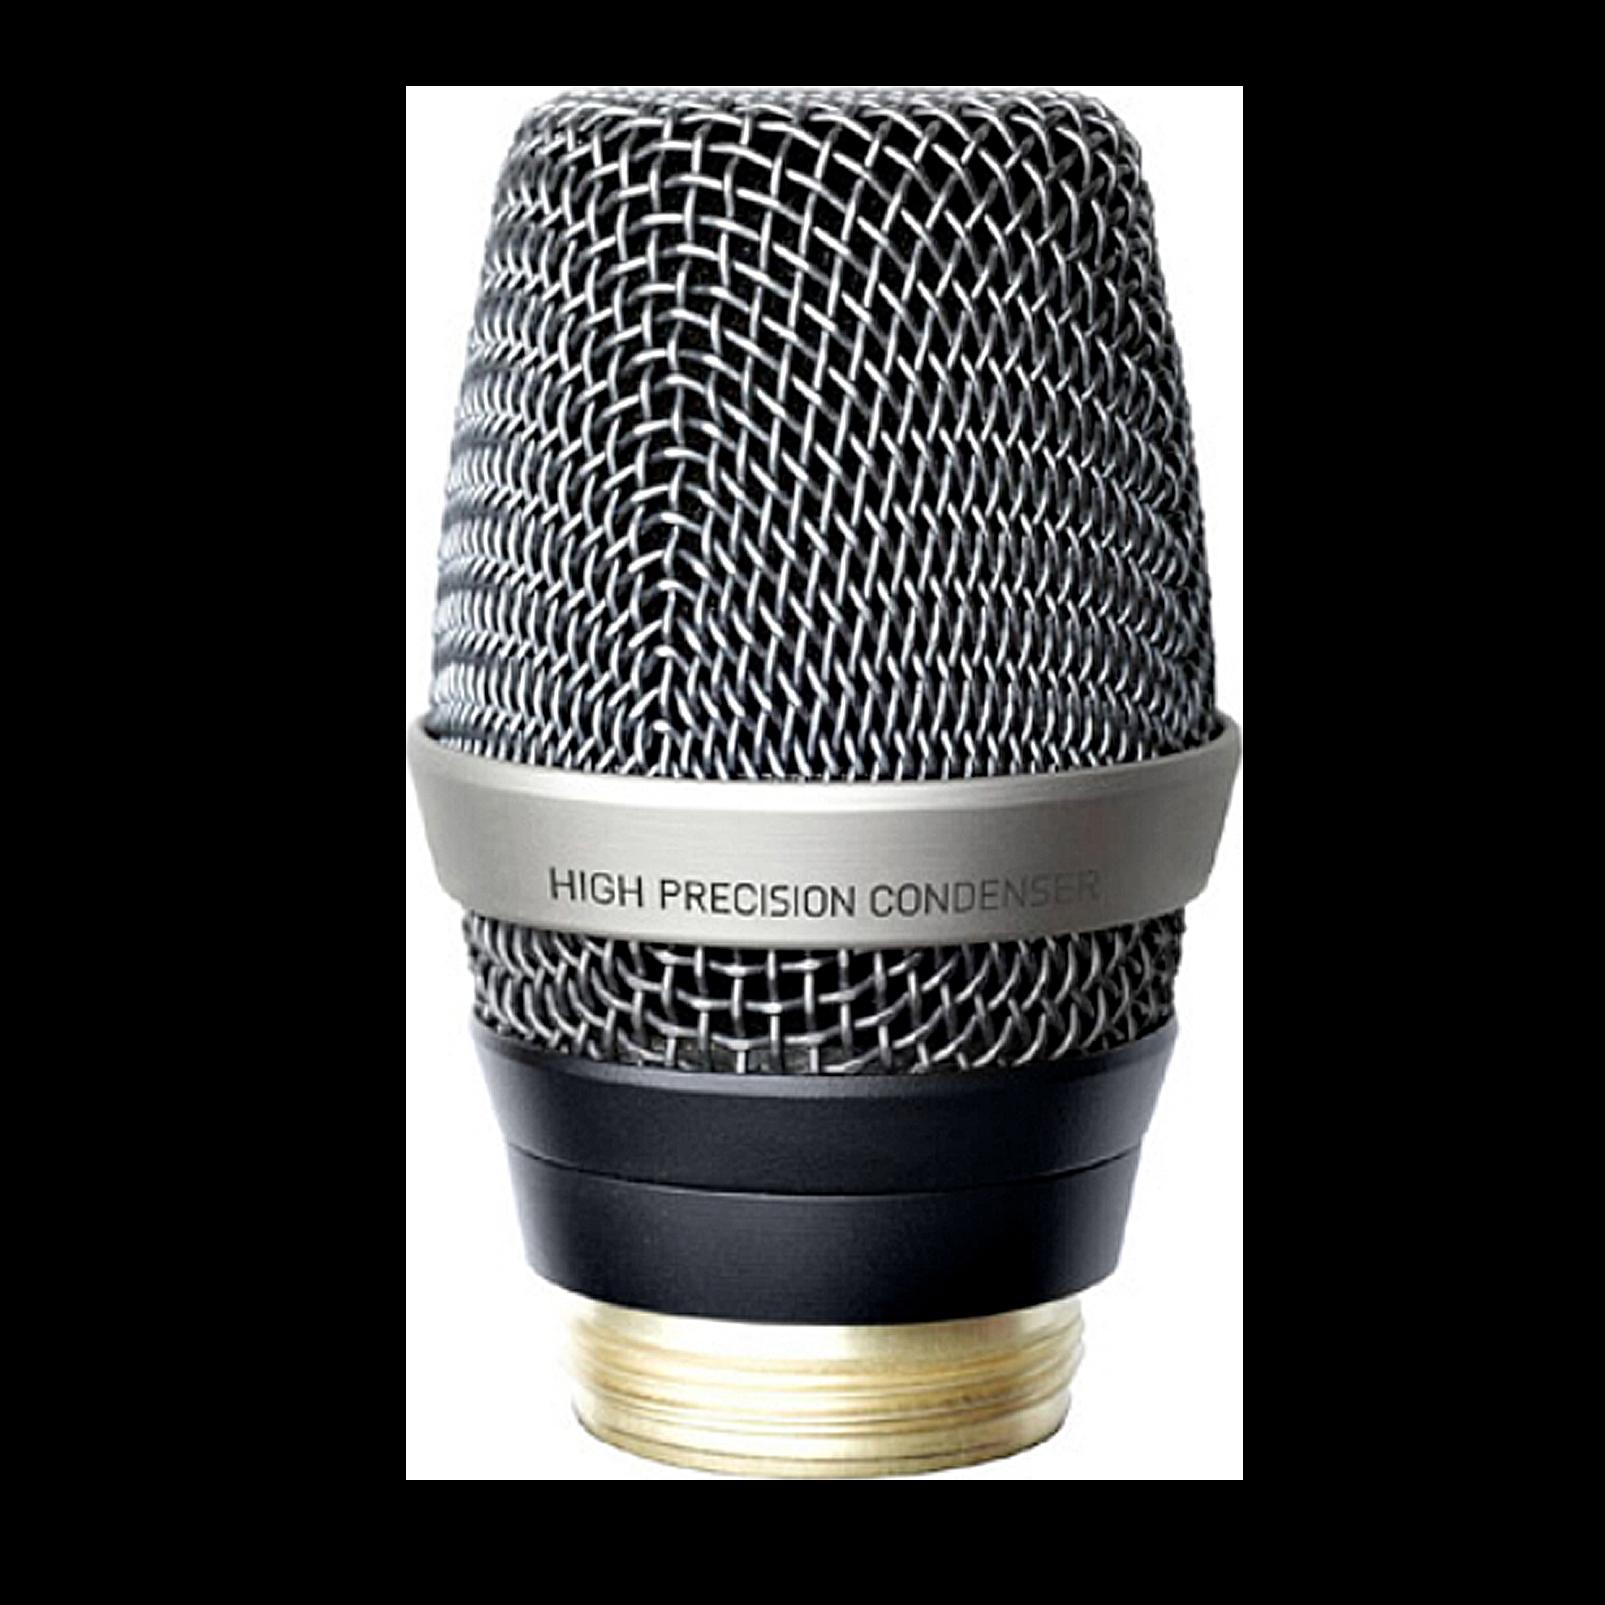 C7 WL1 - Black - Reference condenser vocal microphone head - Hero